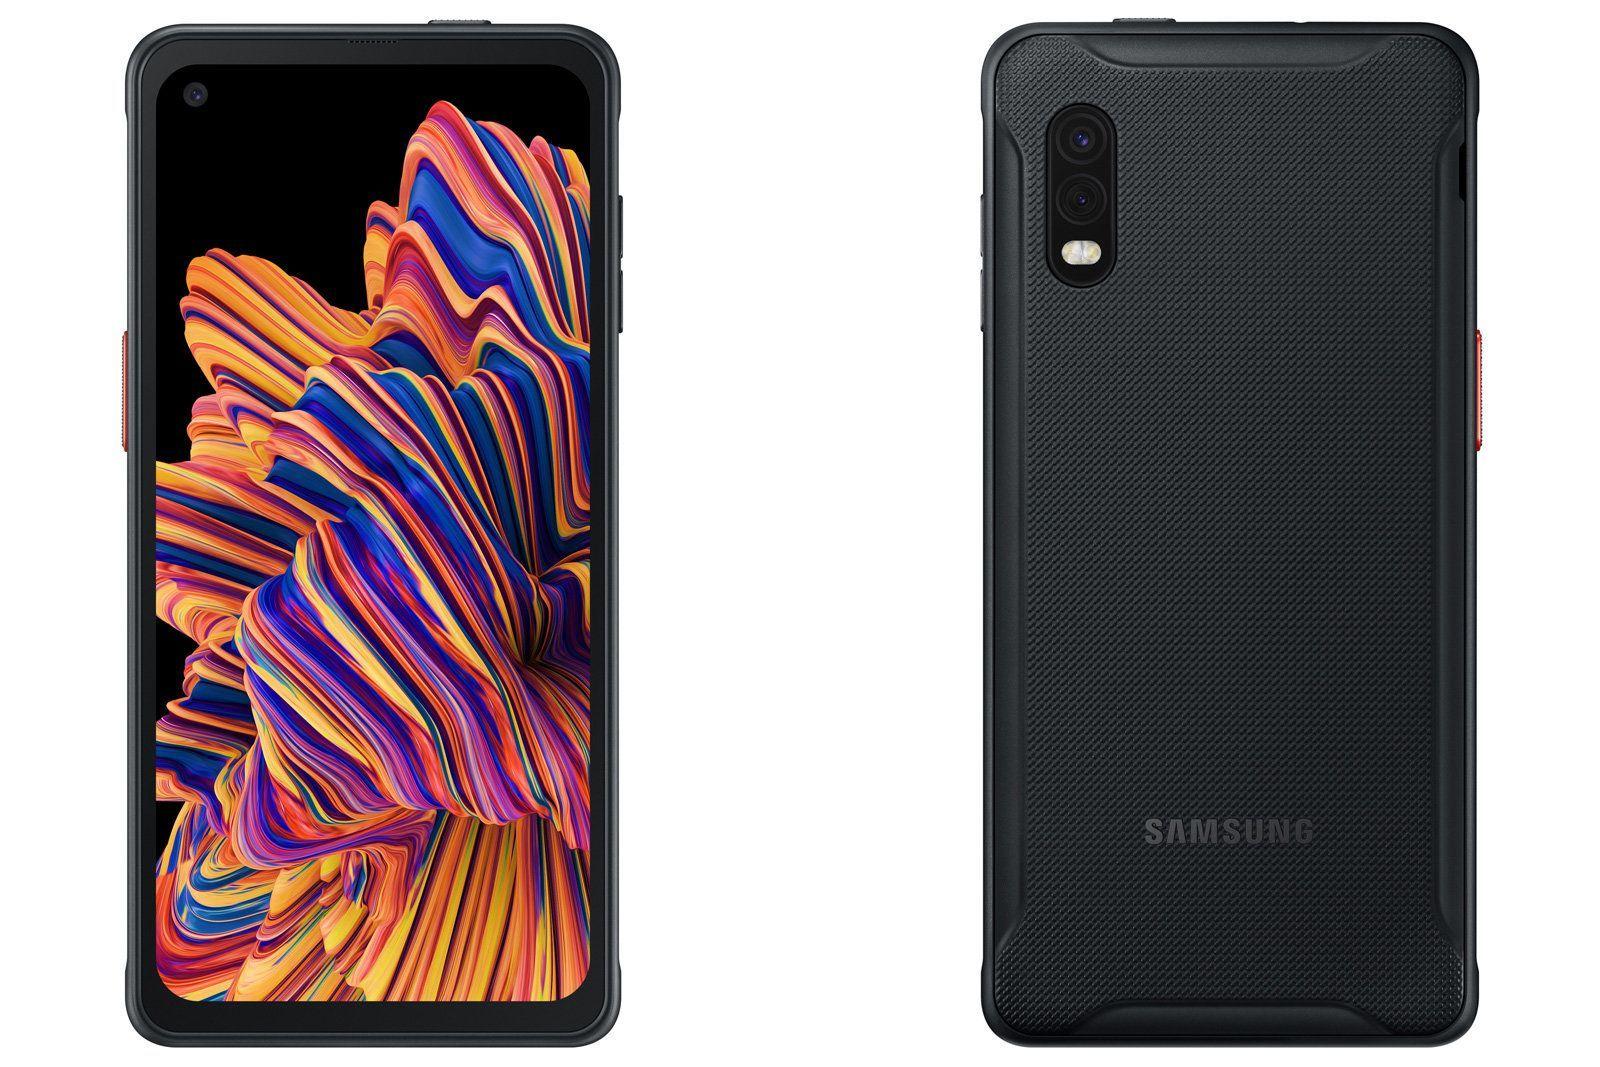 Samsung S Rugged Galaxy Xcover Pro Includes A Swappable Battery In 2020 Samsung Xcover Galaxy Samsung Galaxy